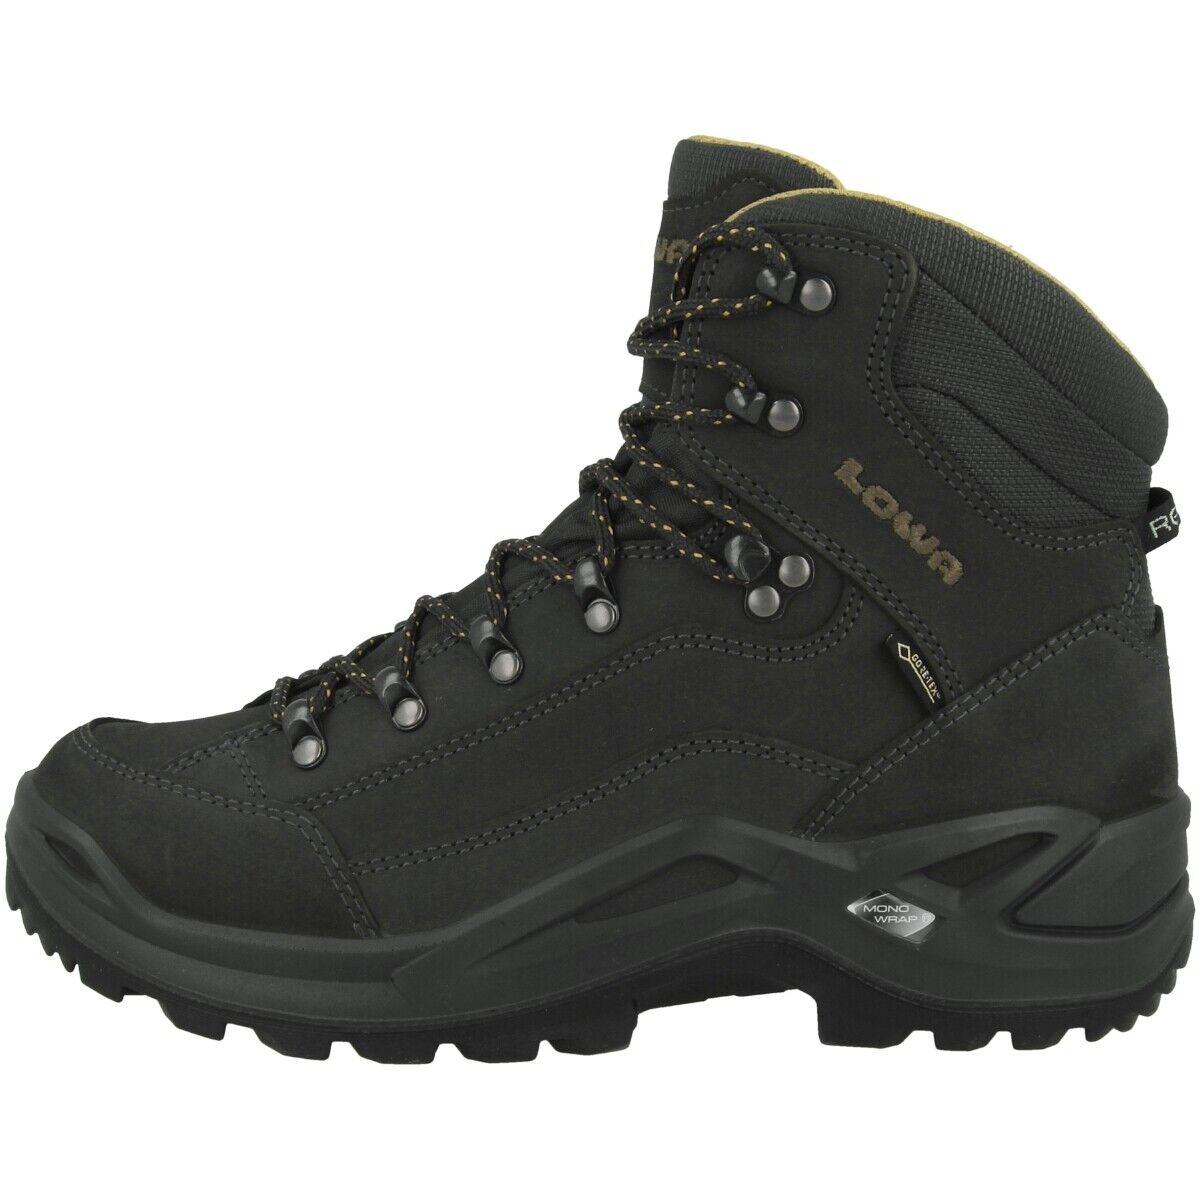 Laaga Renegade GTX Mid mannen Gore-Tex Buitenshuis Hiking schoenen Charcoil 310945-9748